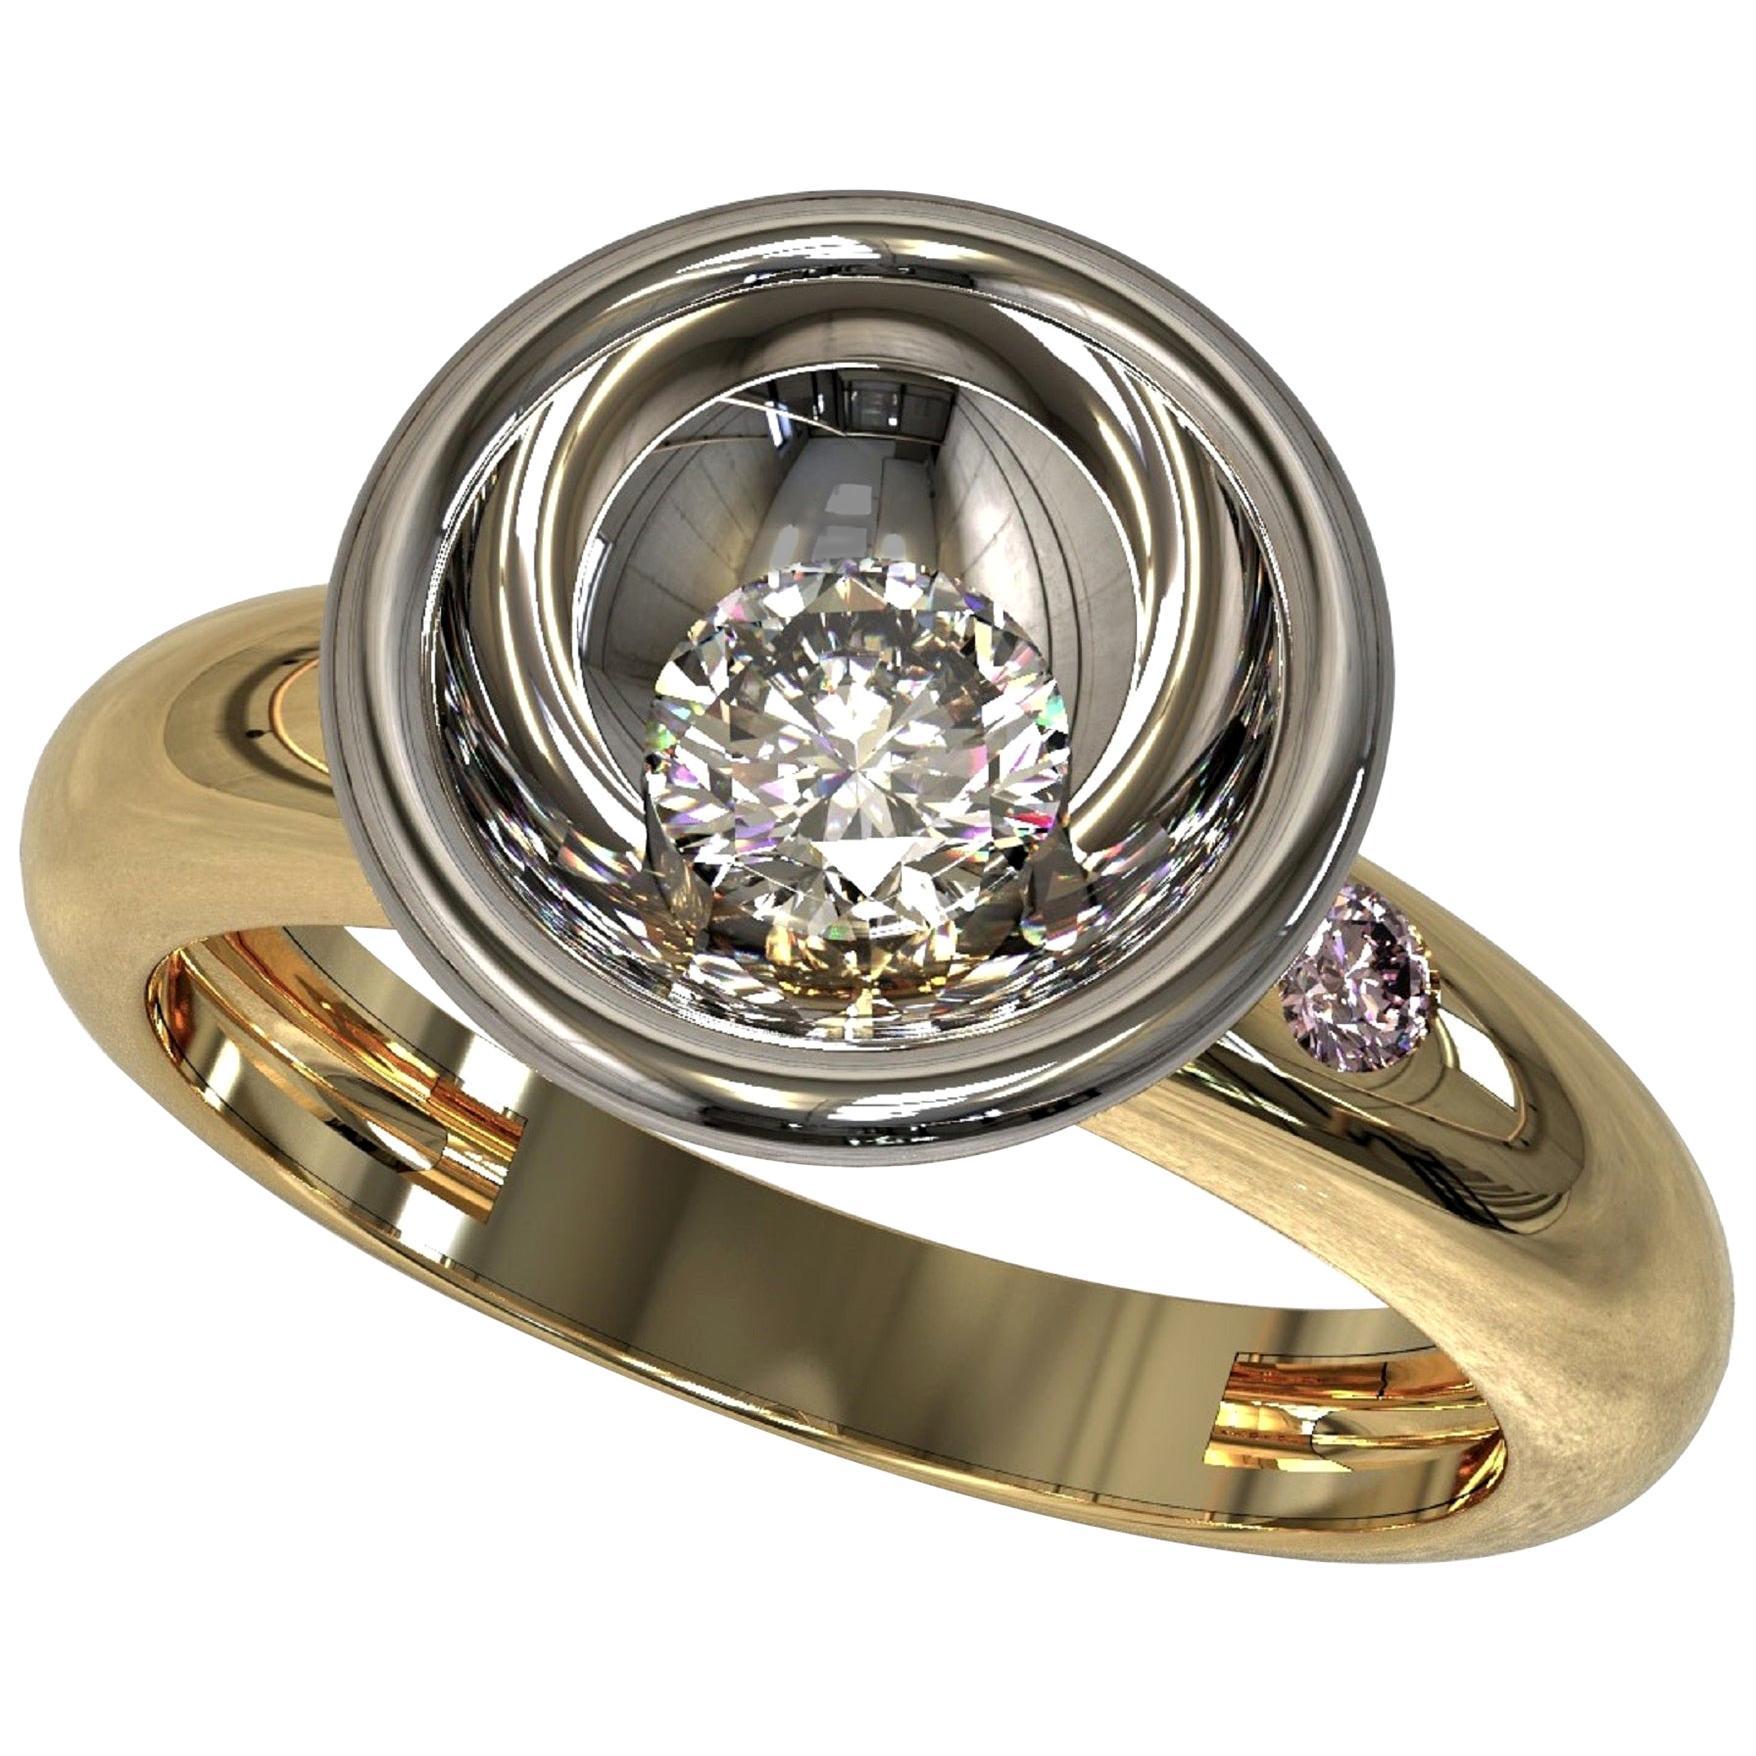 Kian Design White and Pink Diamond Engagement Ring Platinum 18 Carat Yellow Gold